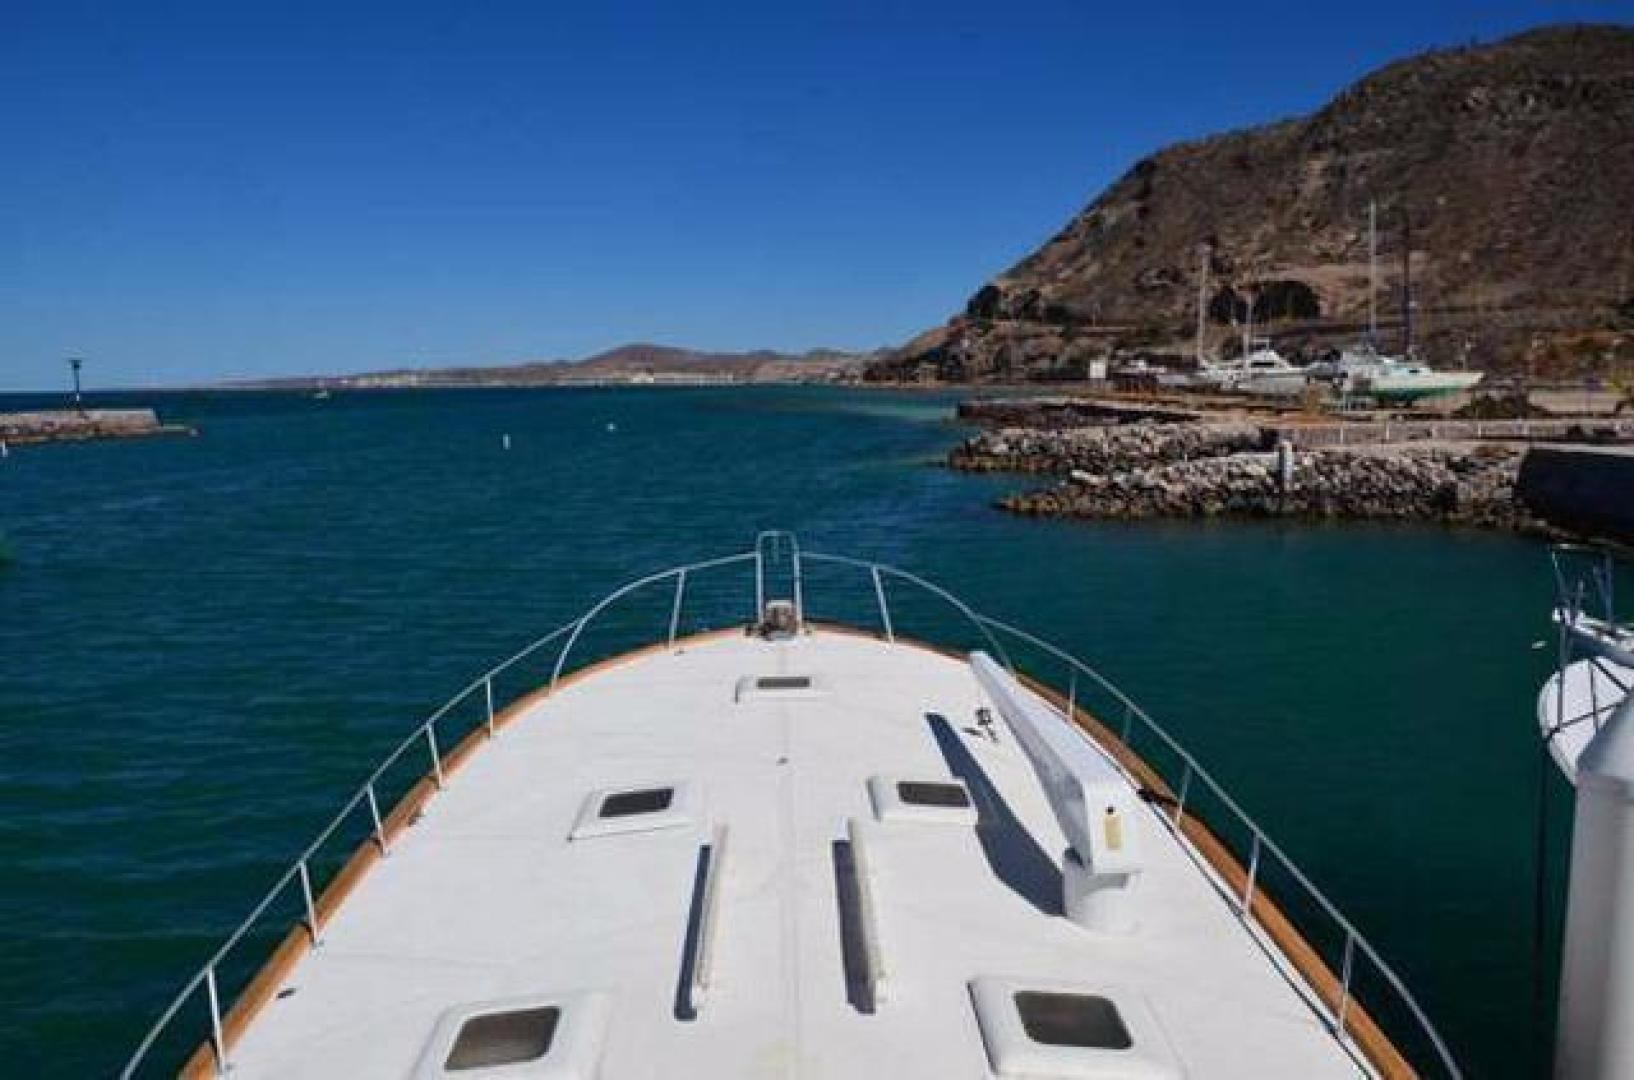 Buddy Davis-Sport Fishing Motor Yacht 1982-Rama III La Paz-Mexico-Foredeck-387261 | Thumbnail